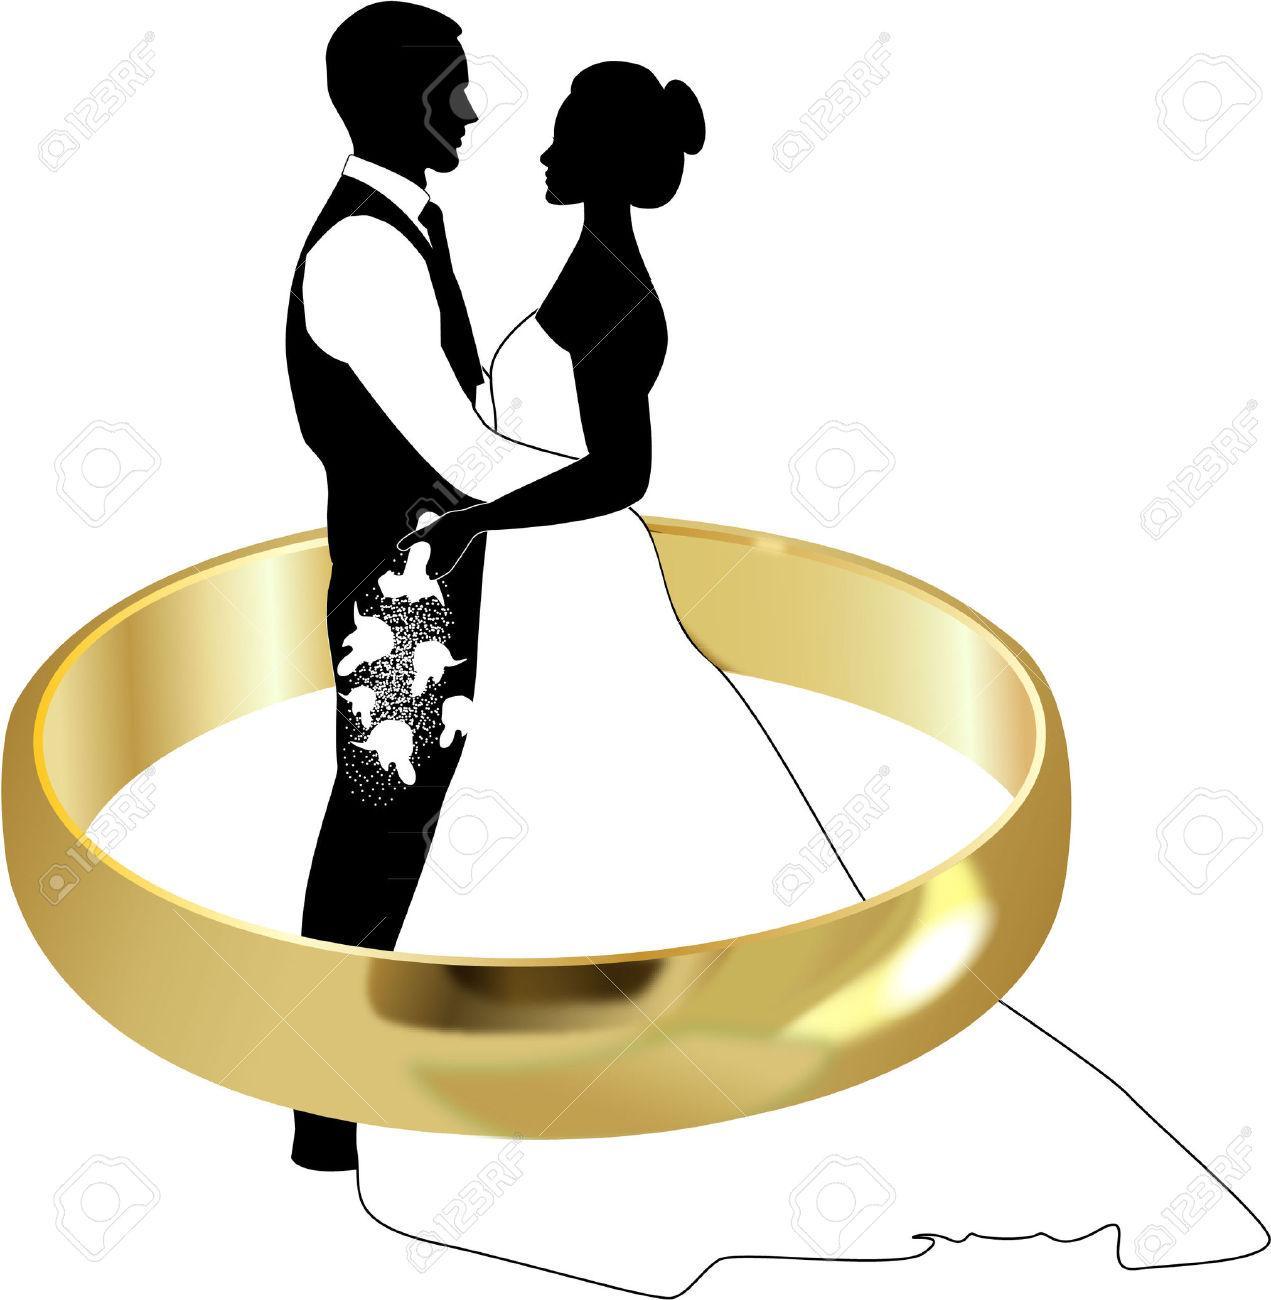 Bildergebnis für menyasszony rajz